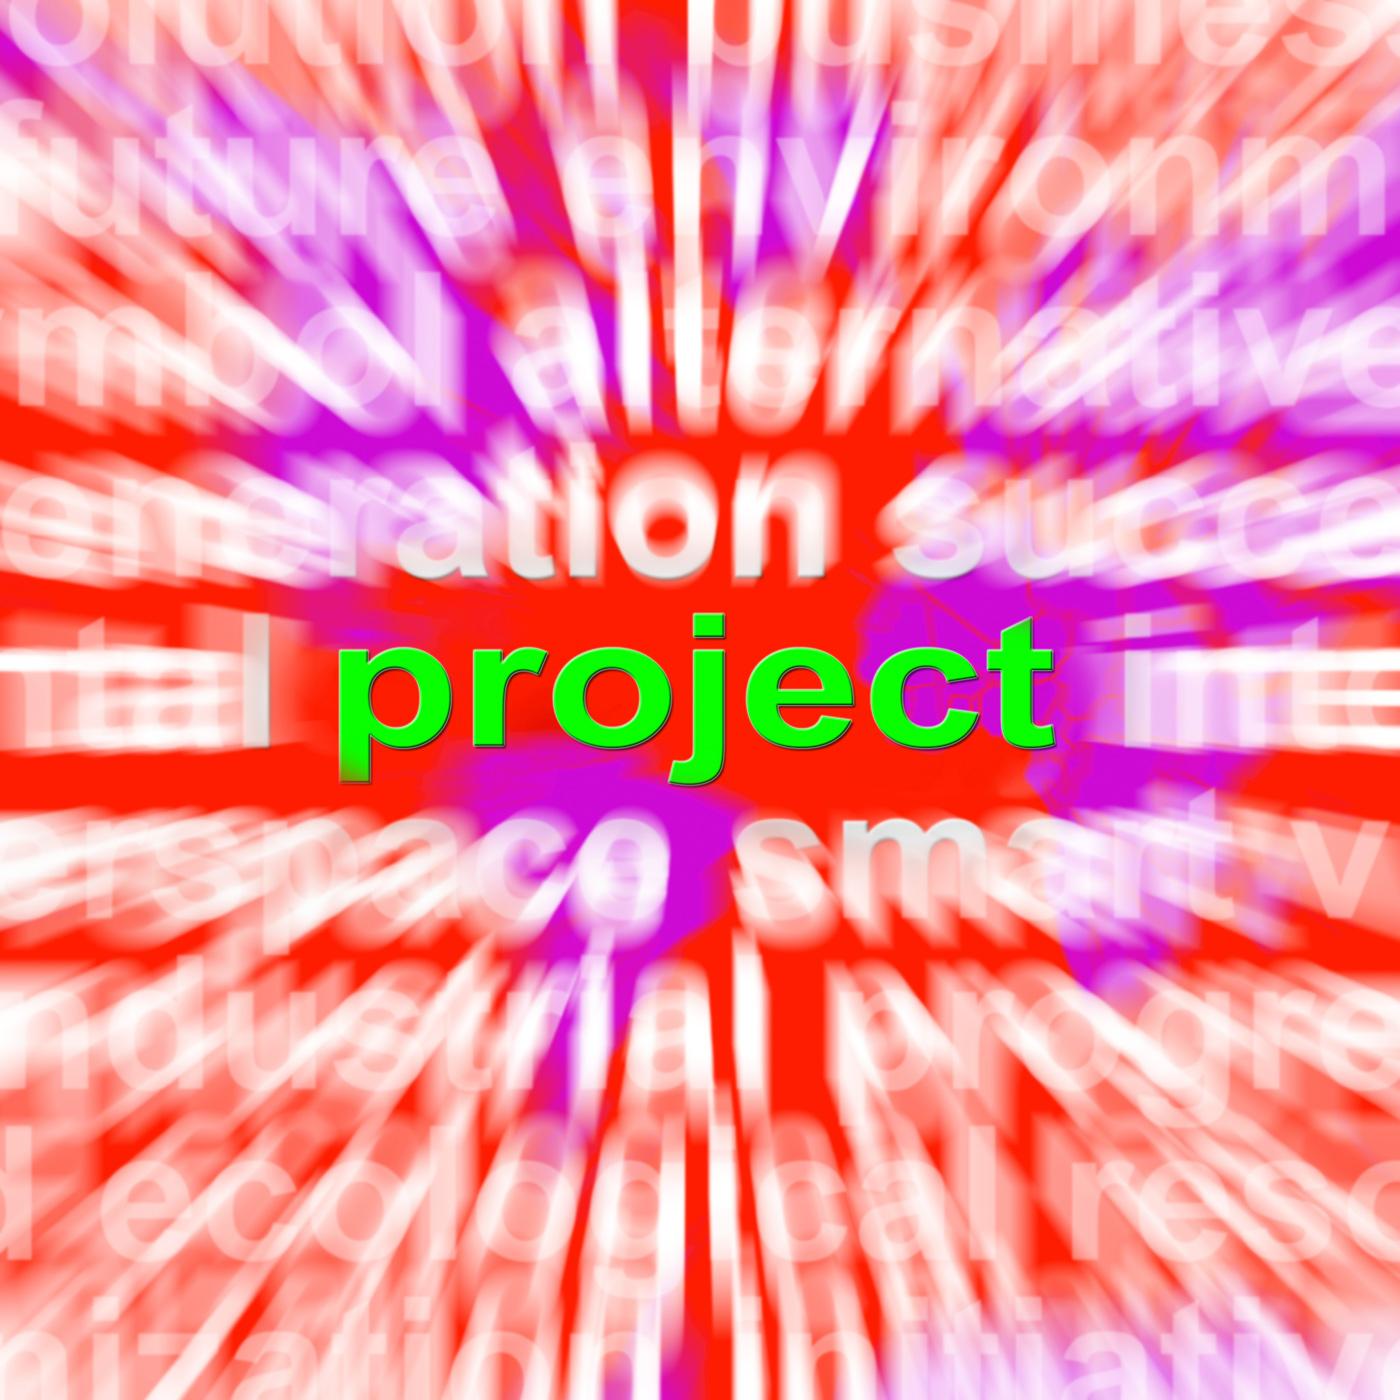 Project Word Cloud Shows Plan Mission Or Task, Activity, Enterprise, Idea, Map, HQ Photo